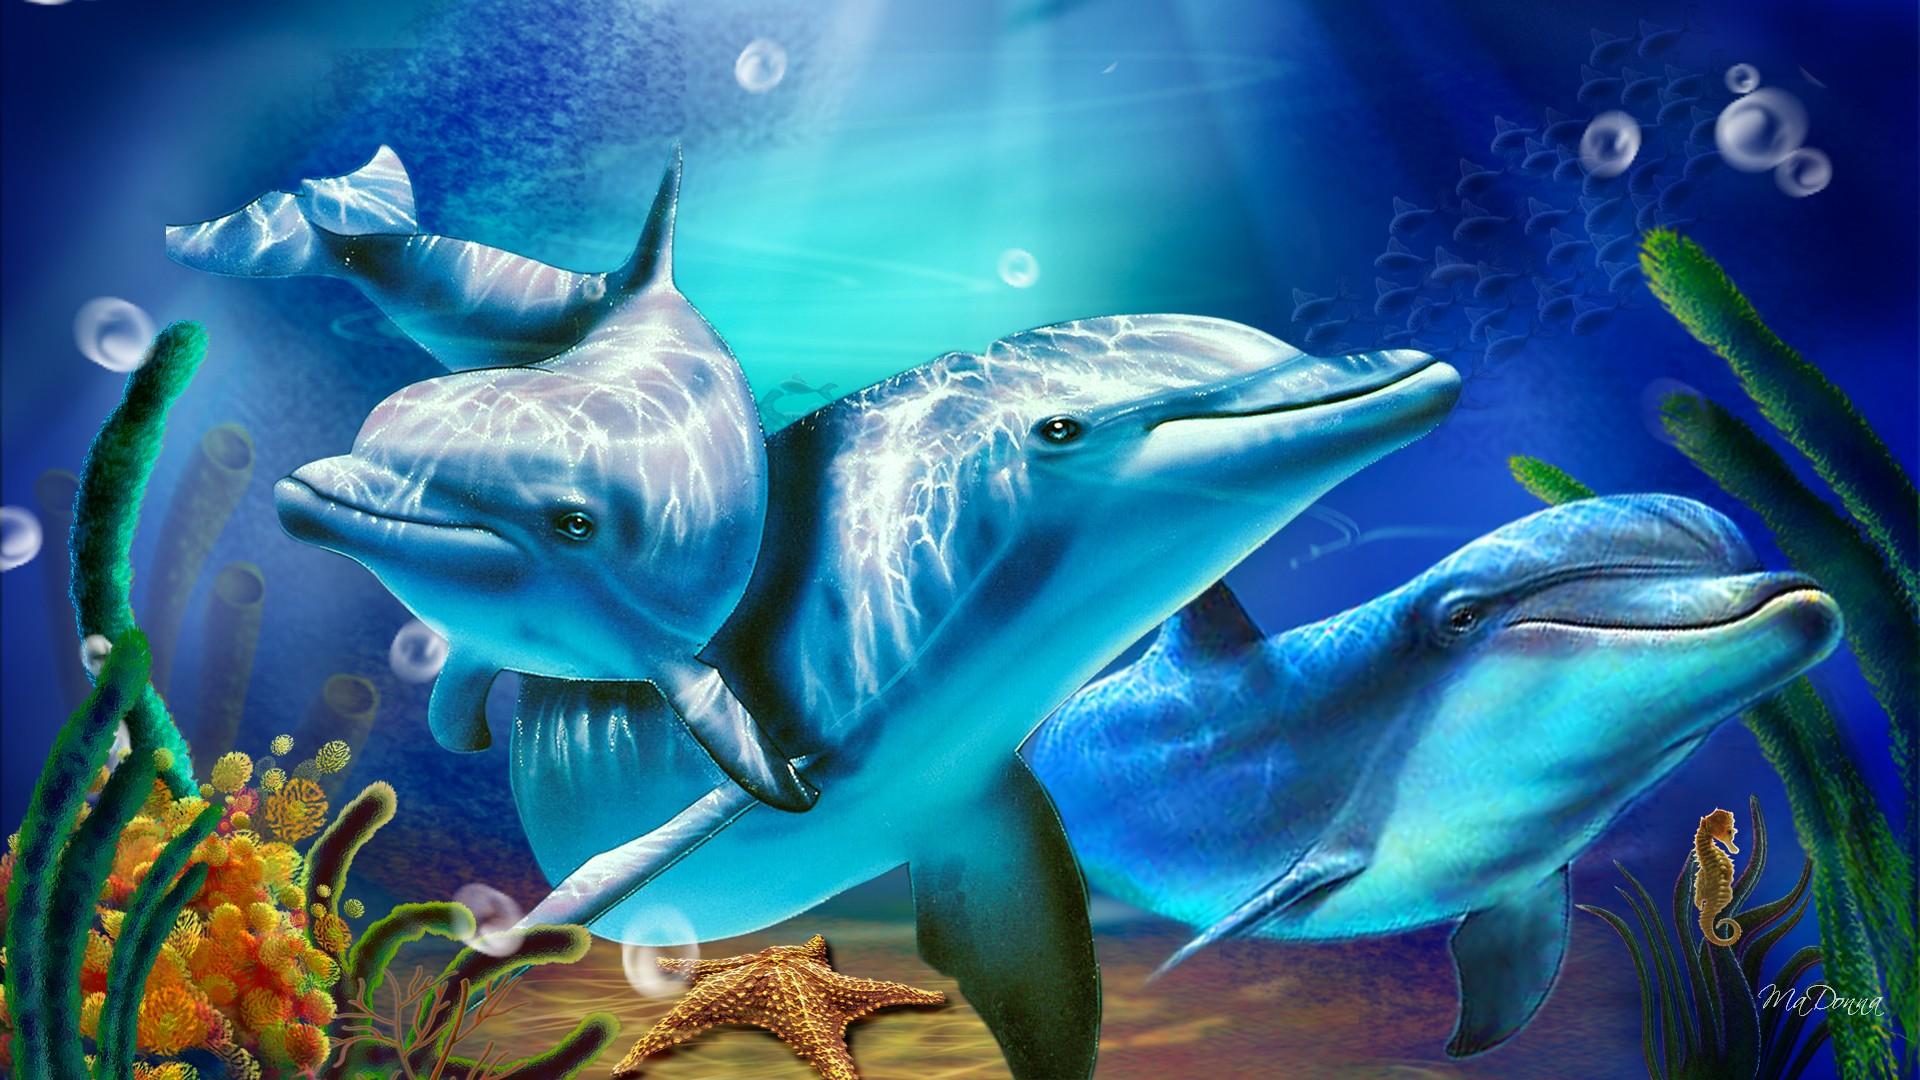 Dolphin Backgrounds wallpaper wallpaper hd background desktop 1920x1080